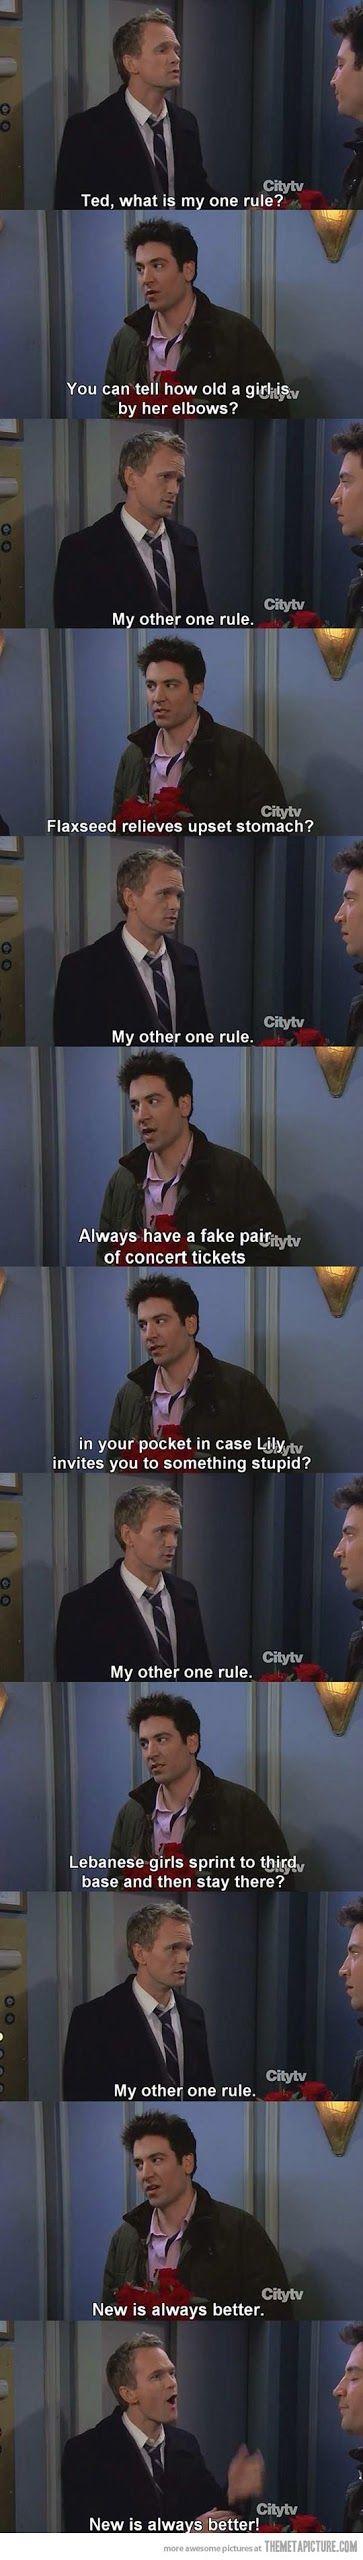 Barney Stinson's one rule